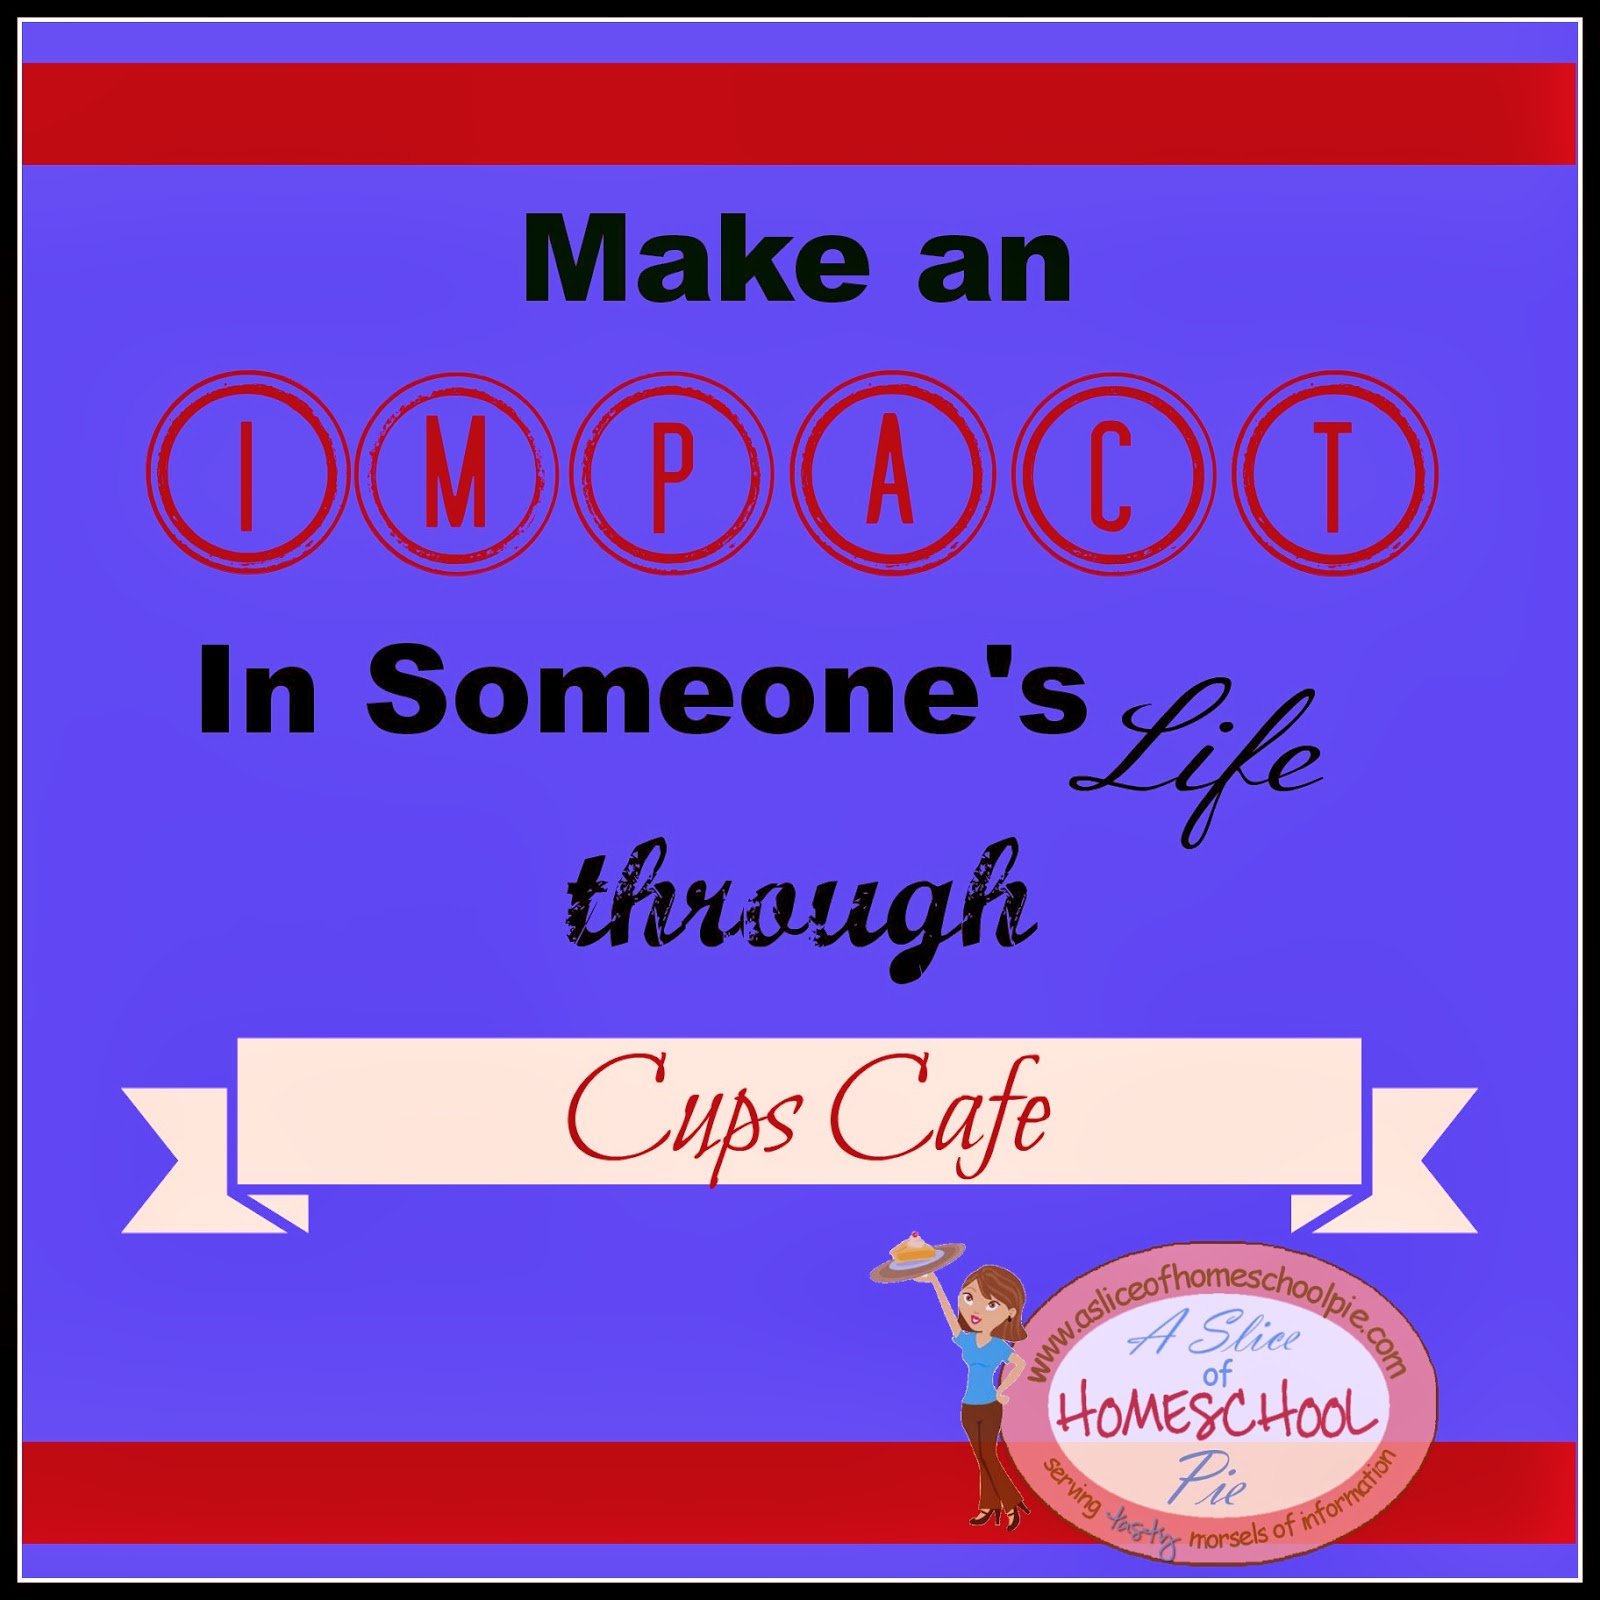 Cups-Cafe-ASliceOfHomeschoolPie.com